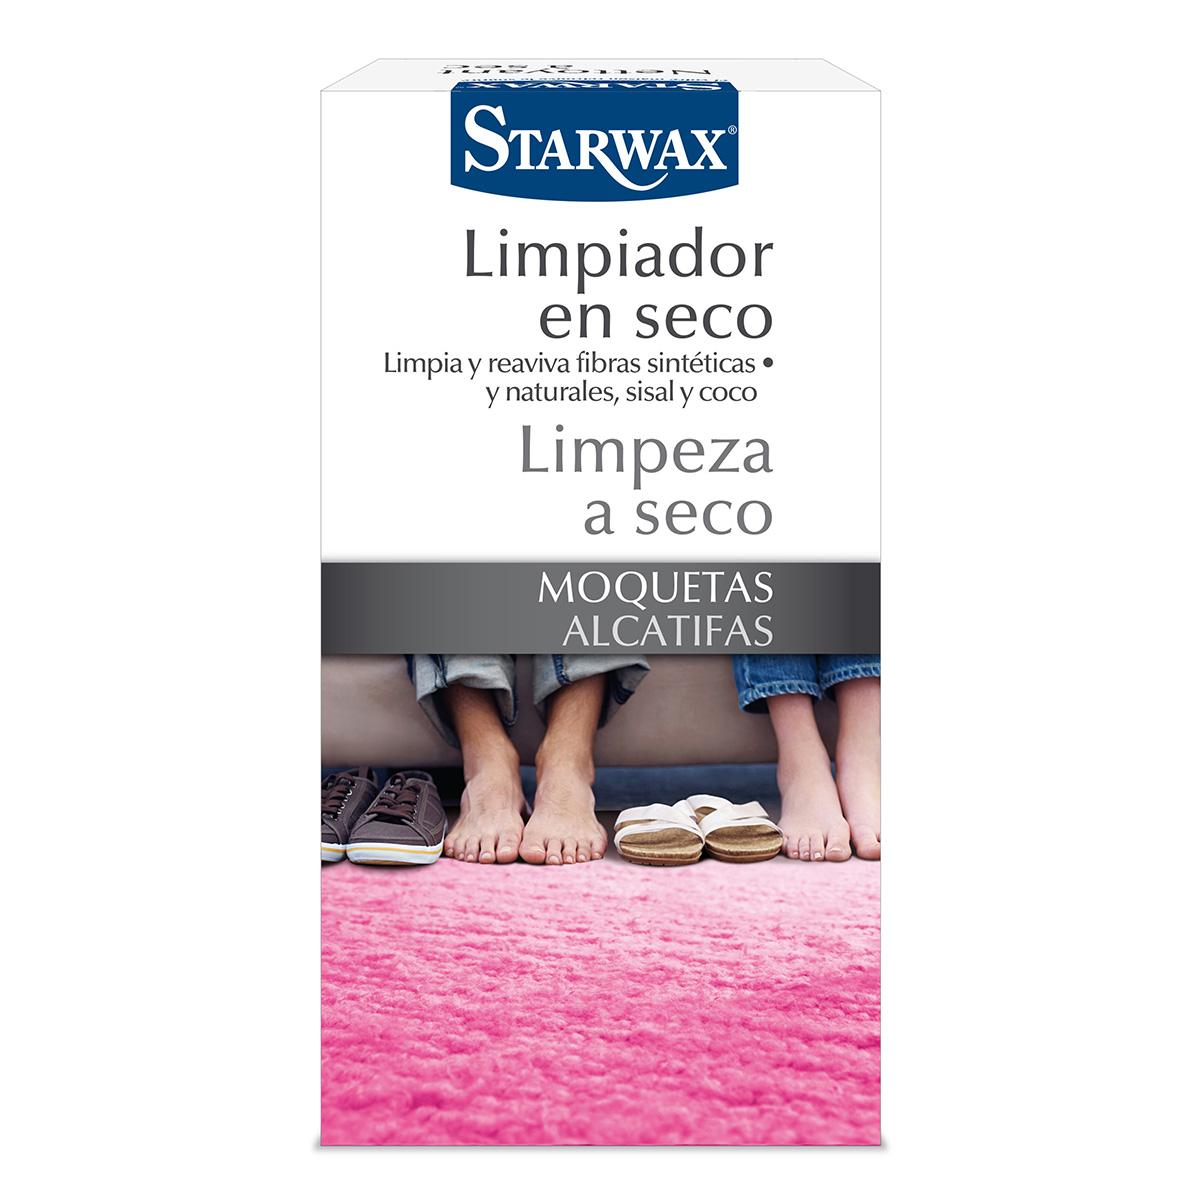 Limpiador en seco moquetas - Starwax